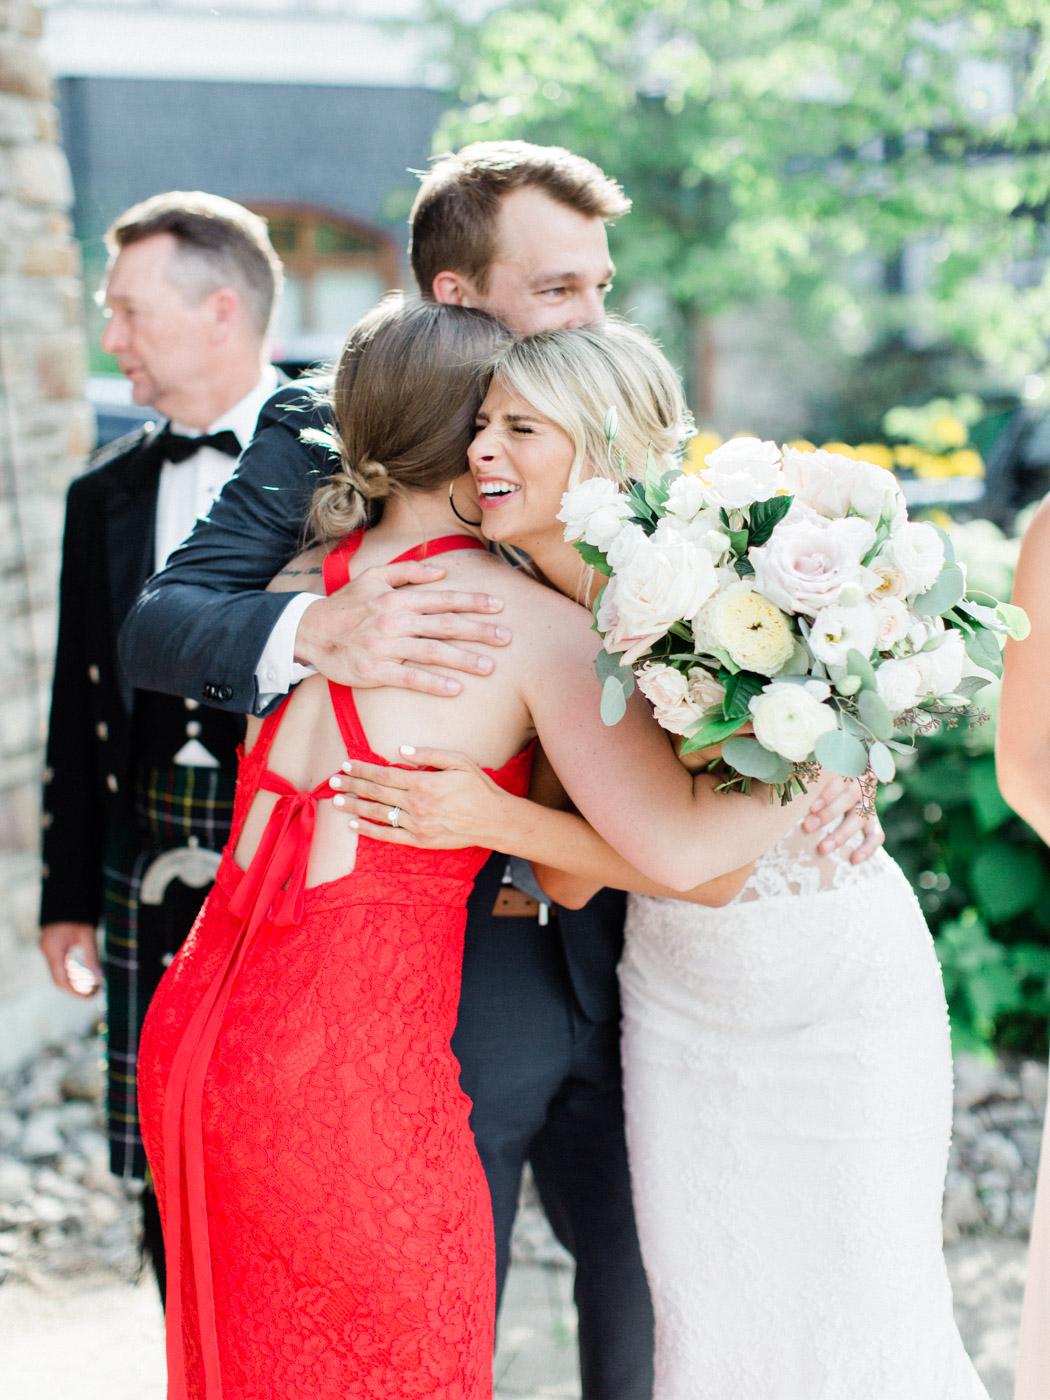 Toronto-Muskoka-wedding-photographer-summery-fun-documentary-the-marriott-rosseau96.jpg